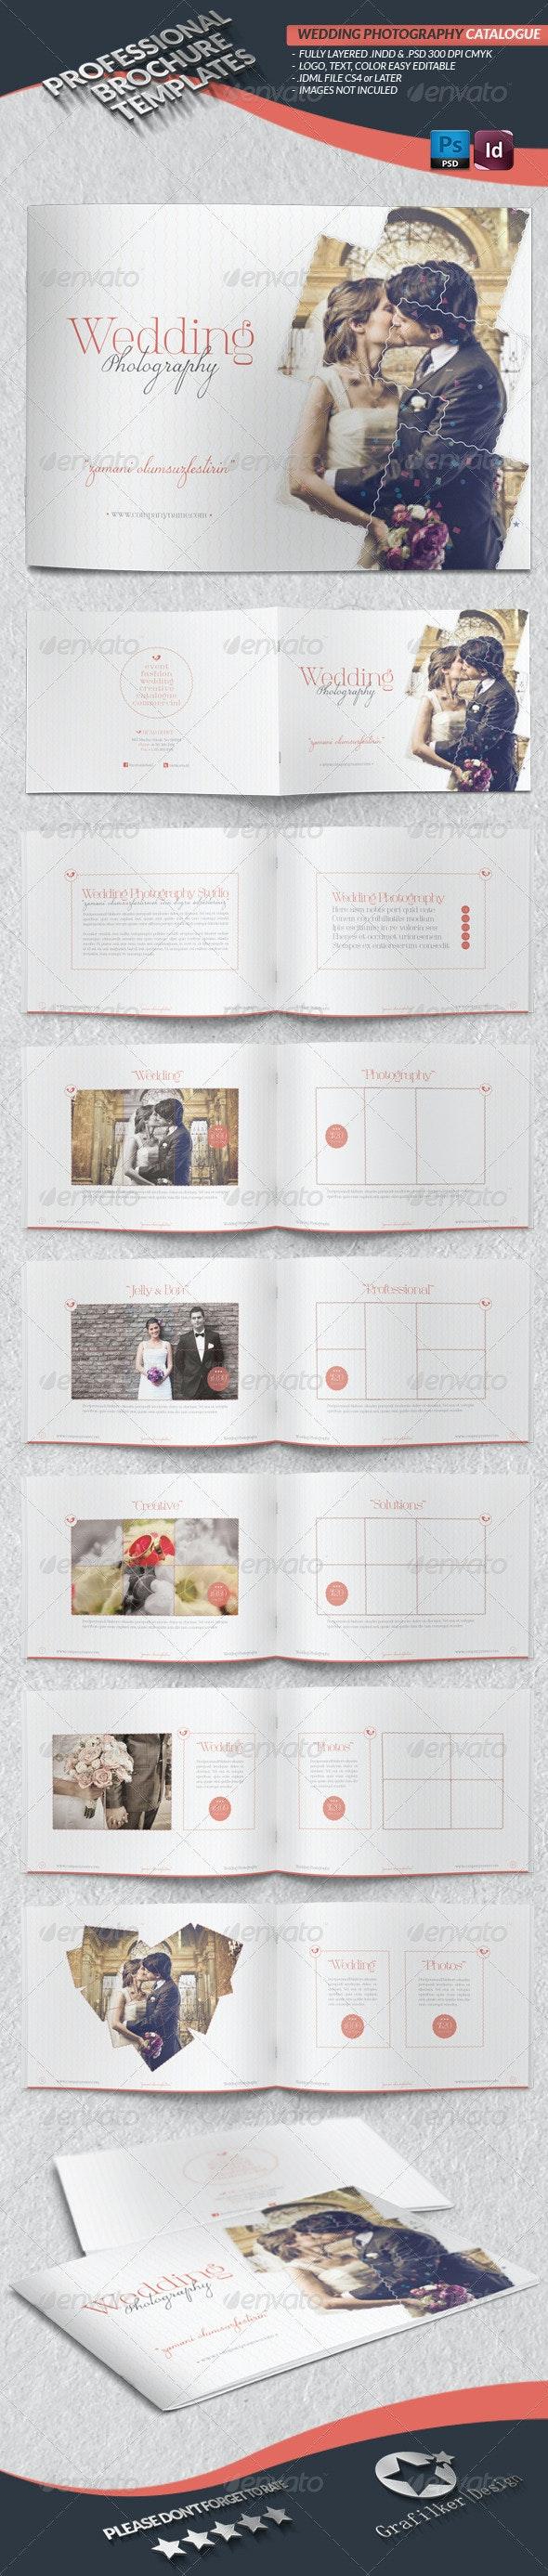 Wedding Photography Catalogue Template - Brochures Print Templates